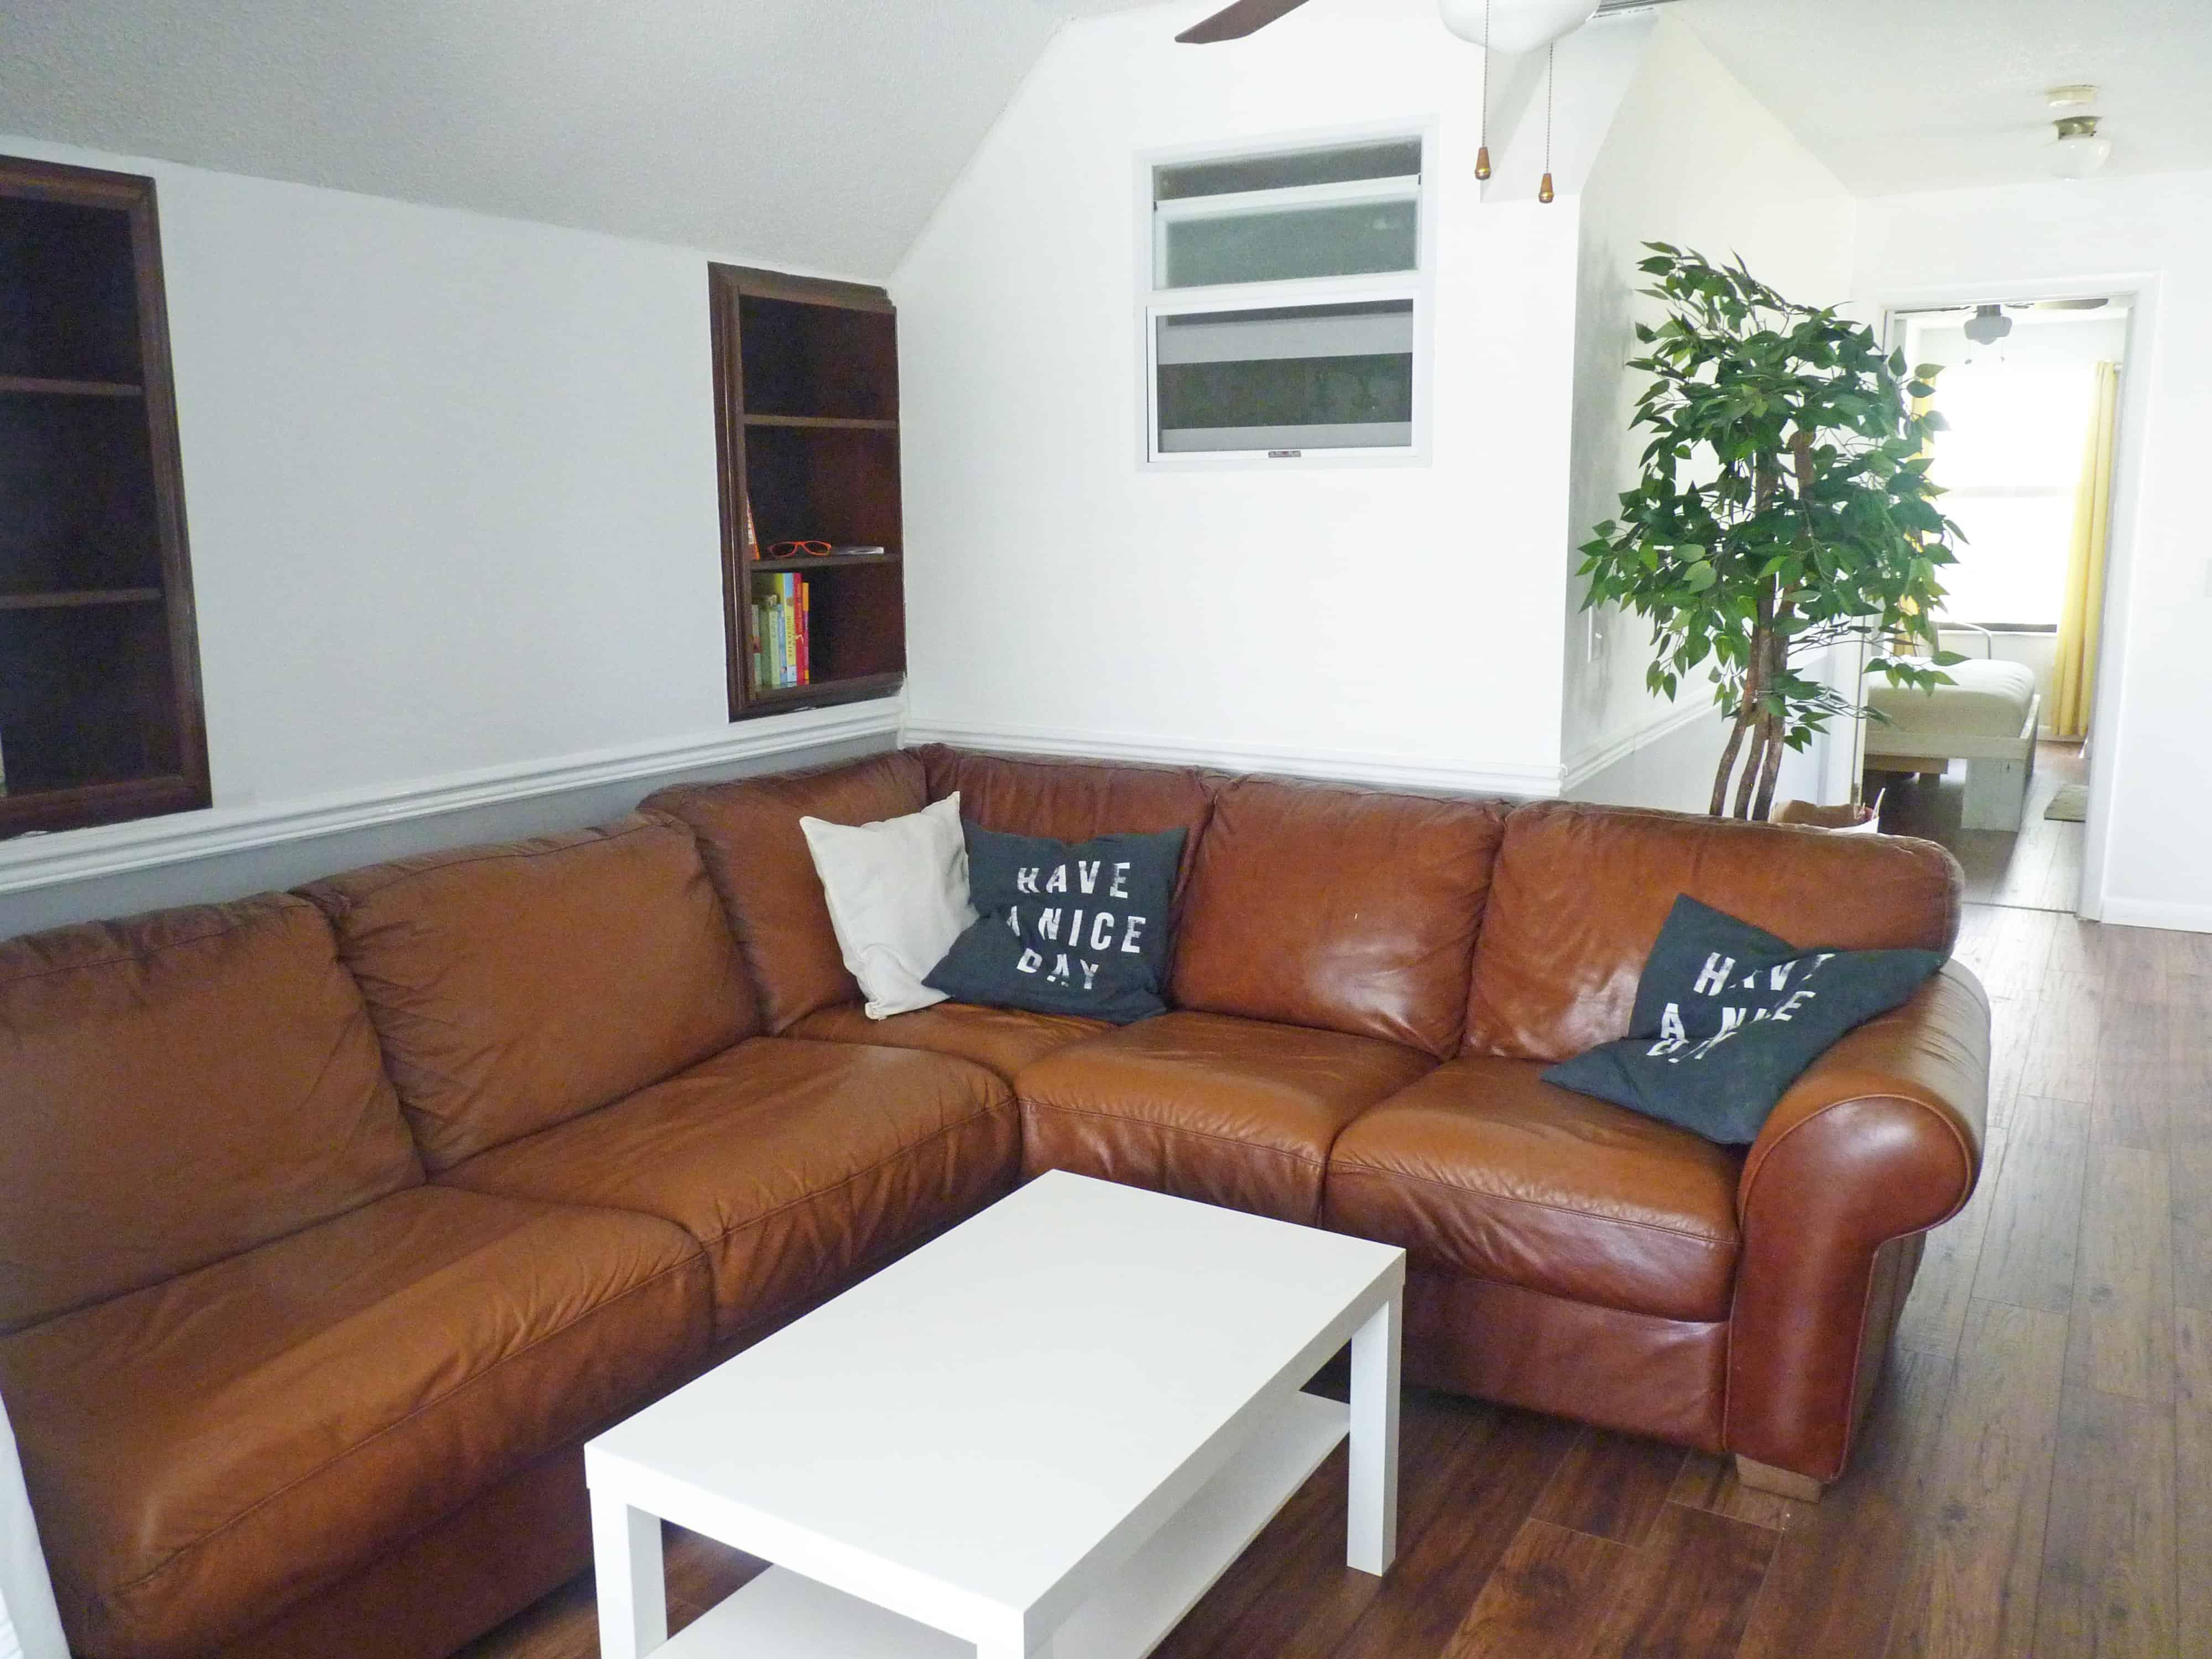 Living Room (first floor)